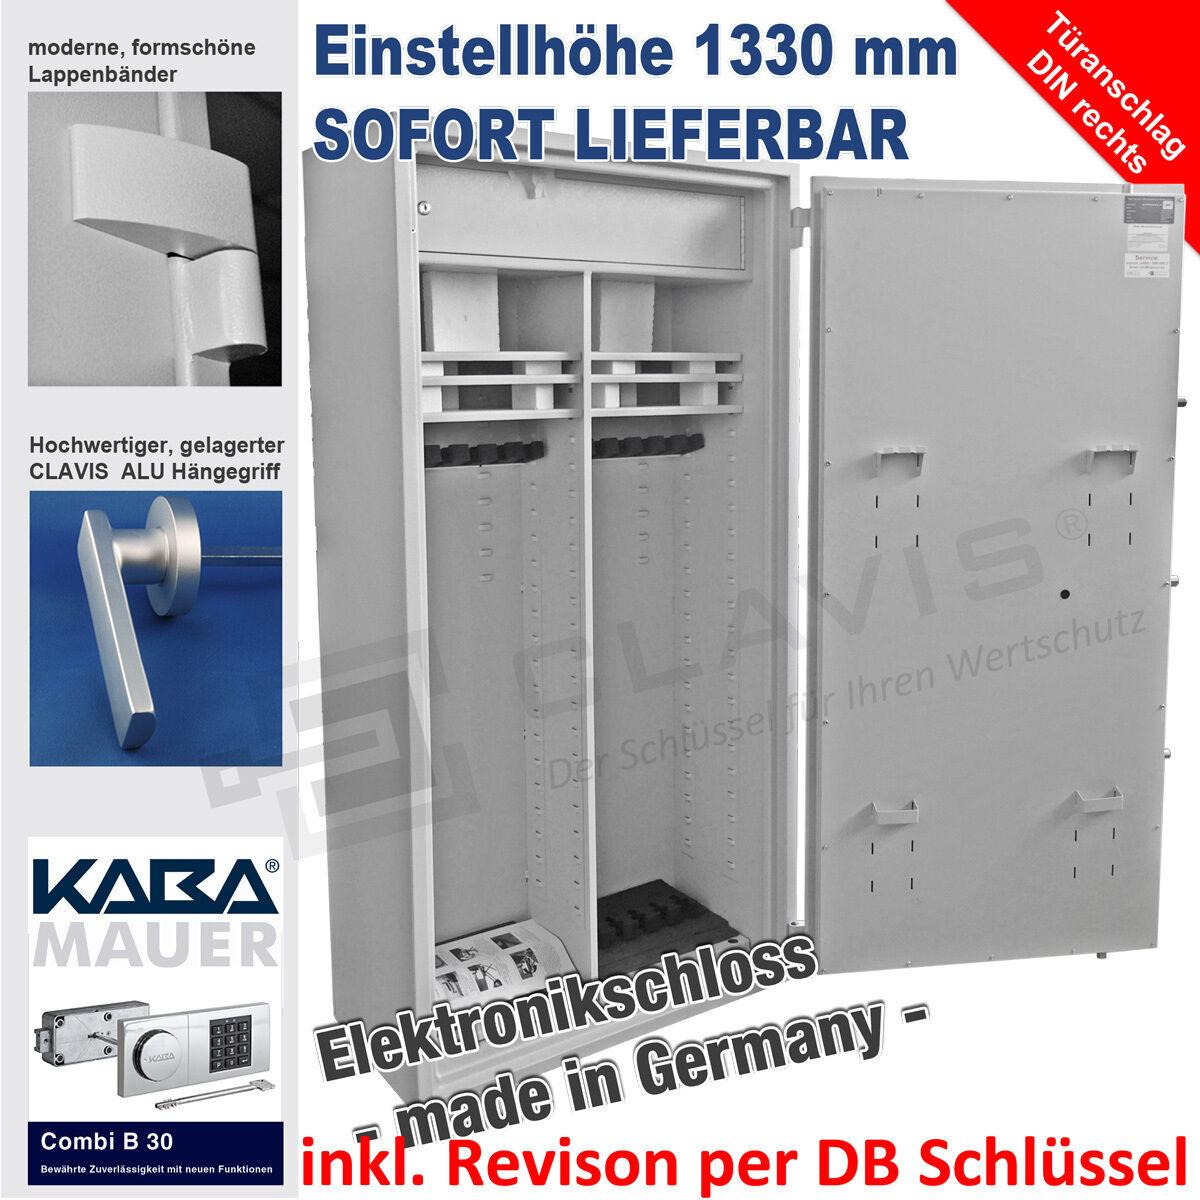 Waffenschrank Kombi-1600 KABA MAUER B 30 Elektronik Revision Klasse I EN 1143-1